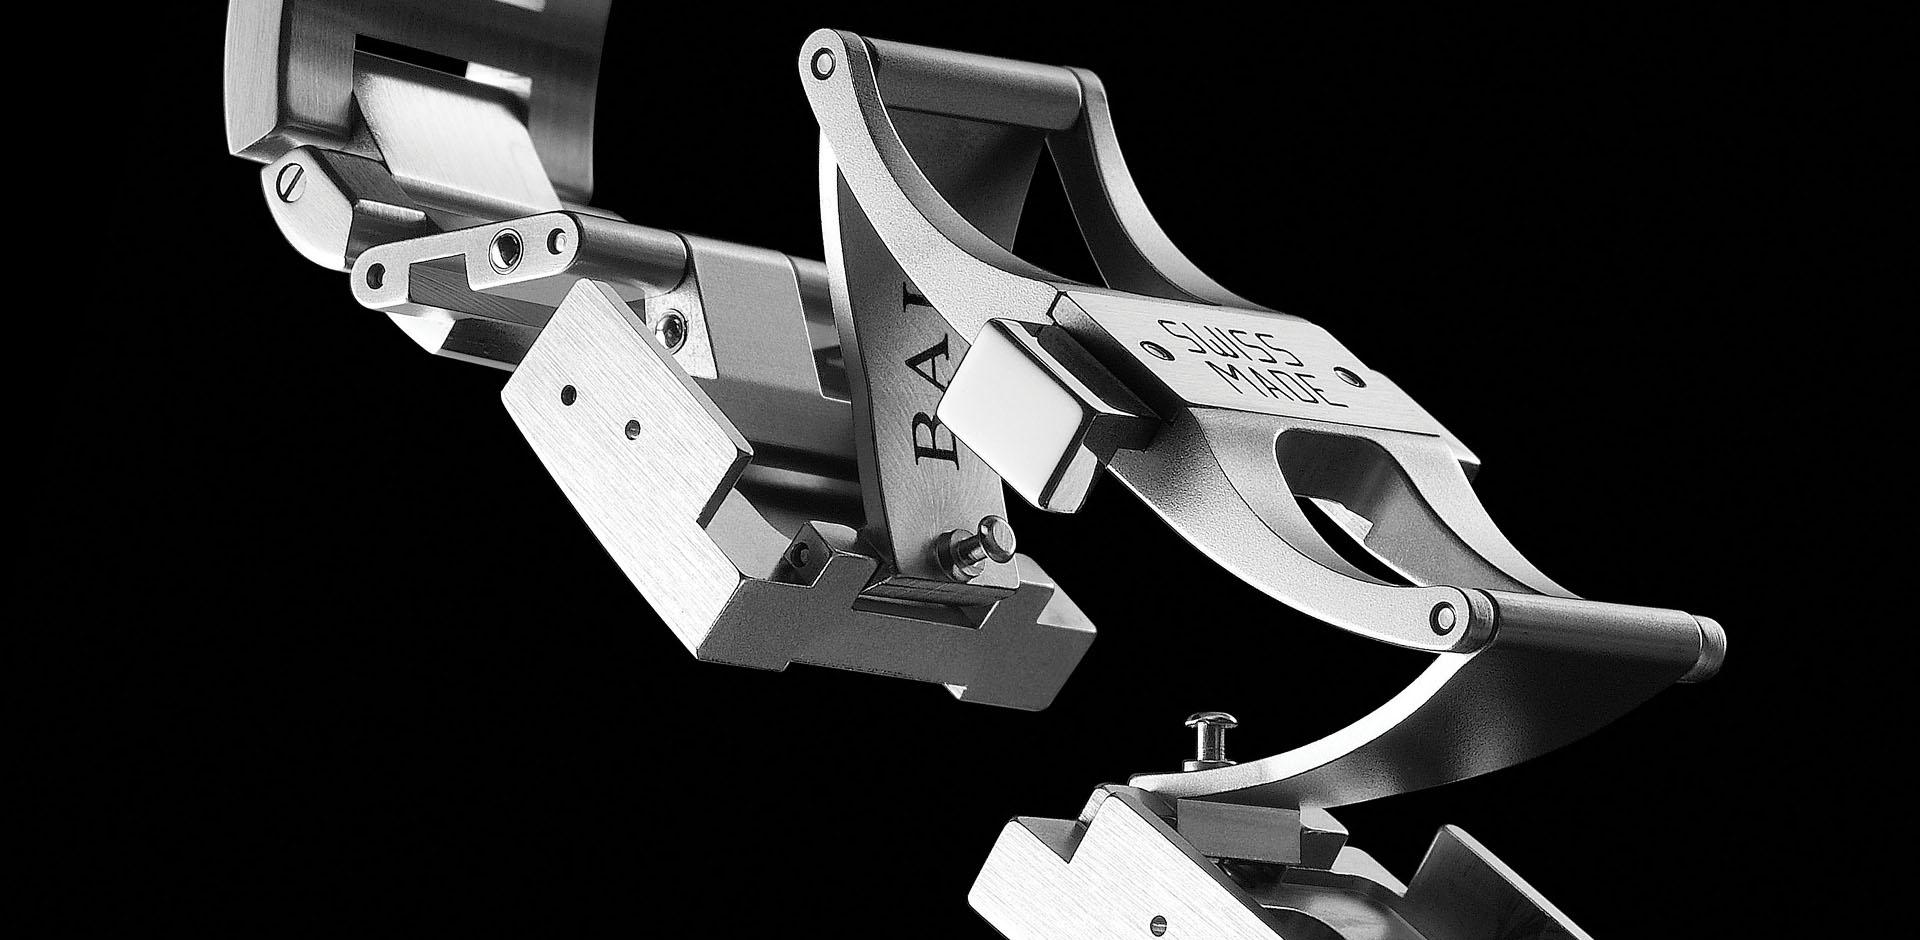 <p><strong>高度耐用和佩戴舒适度的专业表扣</strong><br /> <br /> 波尔表(BALL Watch)专利注册的折迭式表扣及其伸延系统拥有数项优点。表扣是由整块不锈钢制造出来,令耐用度增加而且质素更高。而为令使用者佩戴舒适,整个表扣的重量作平均分布,力求完美。表扣中的各个组件都是均衡设置于表扣的金属盖之下。在表带两旁,是22毫米长的&ldquo;伸延系统&rdquo; ,令表带可美观地配衬各种不同的运动服装。</p>